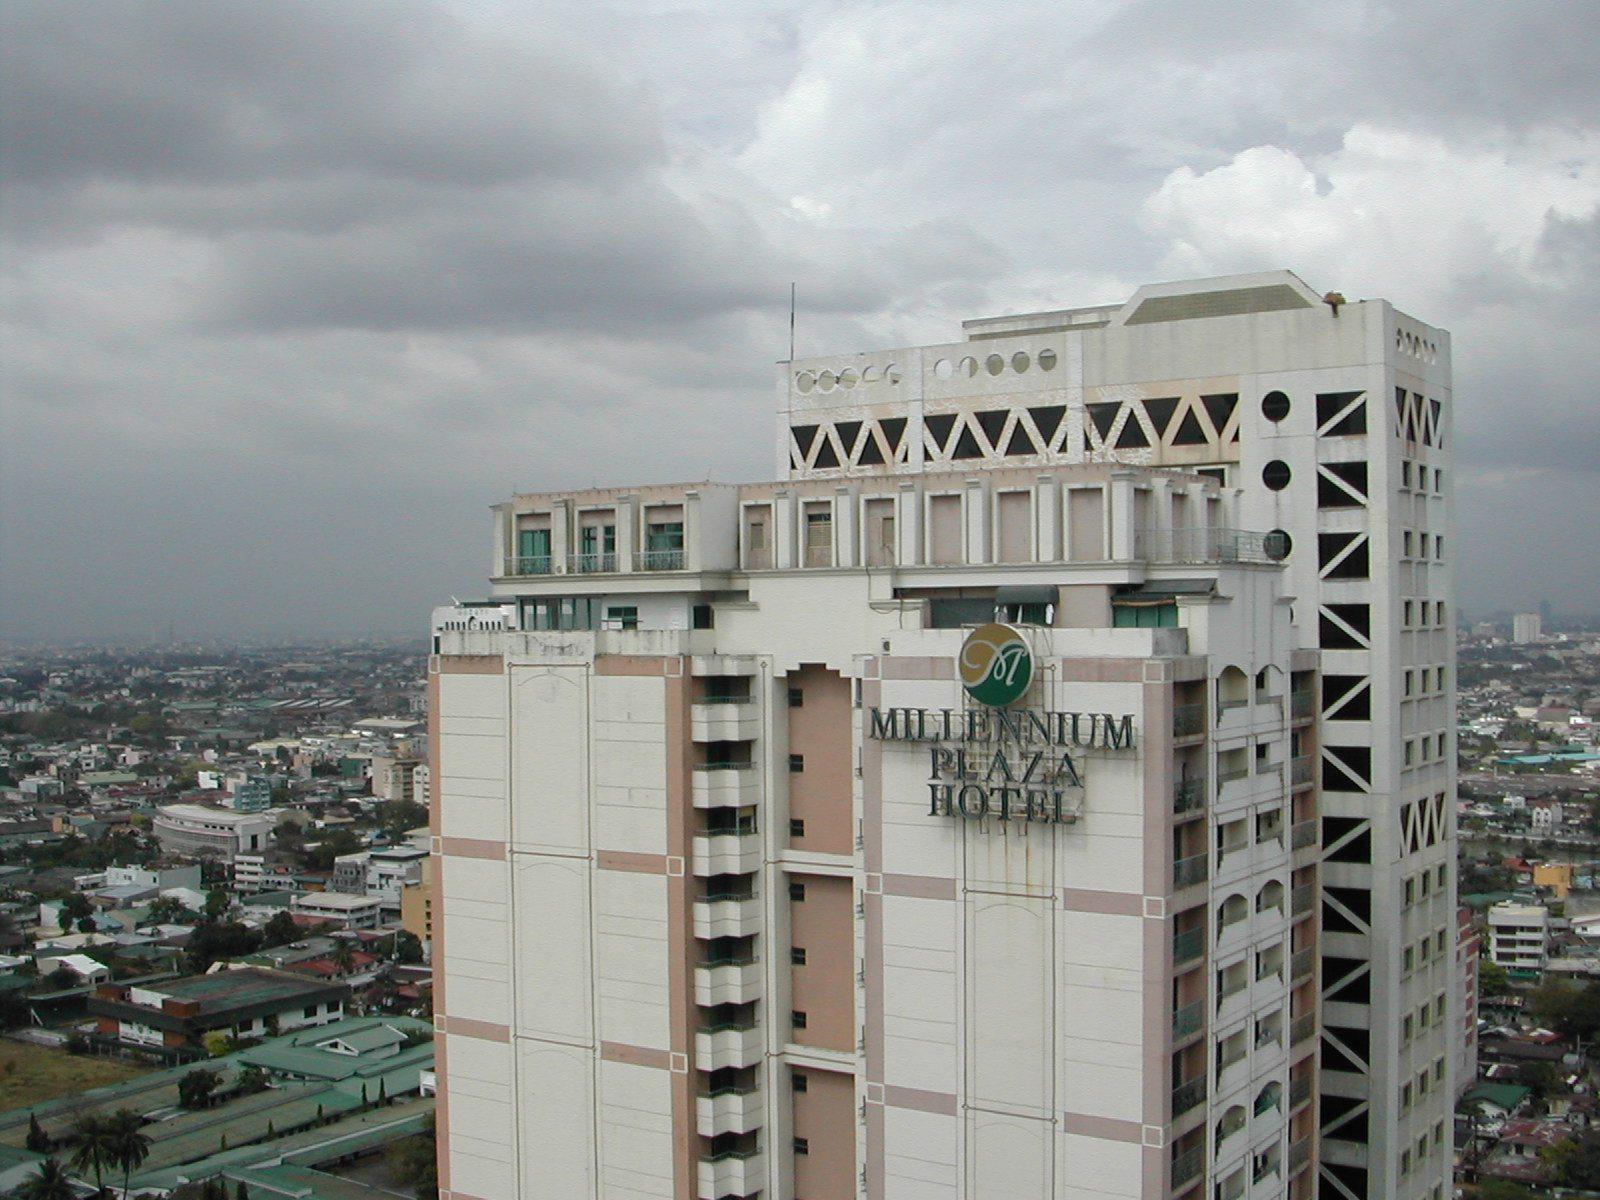 014_City-Garden-Hotel